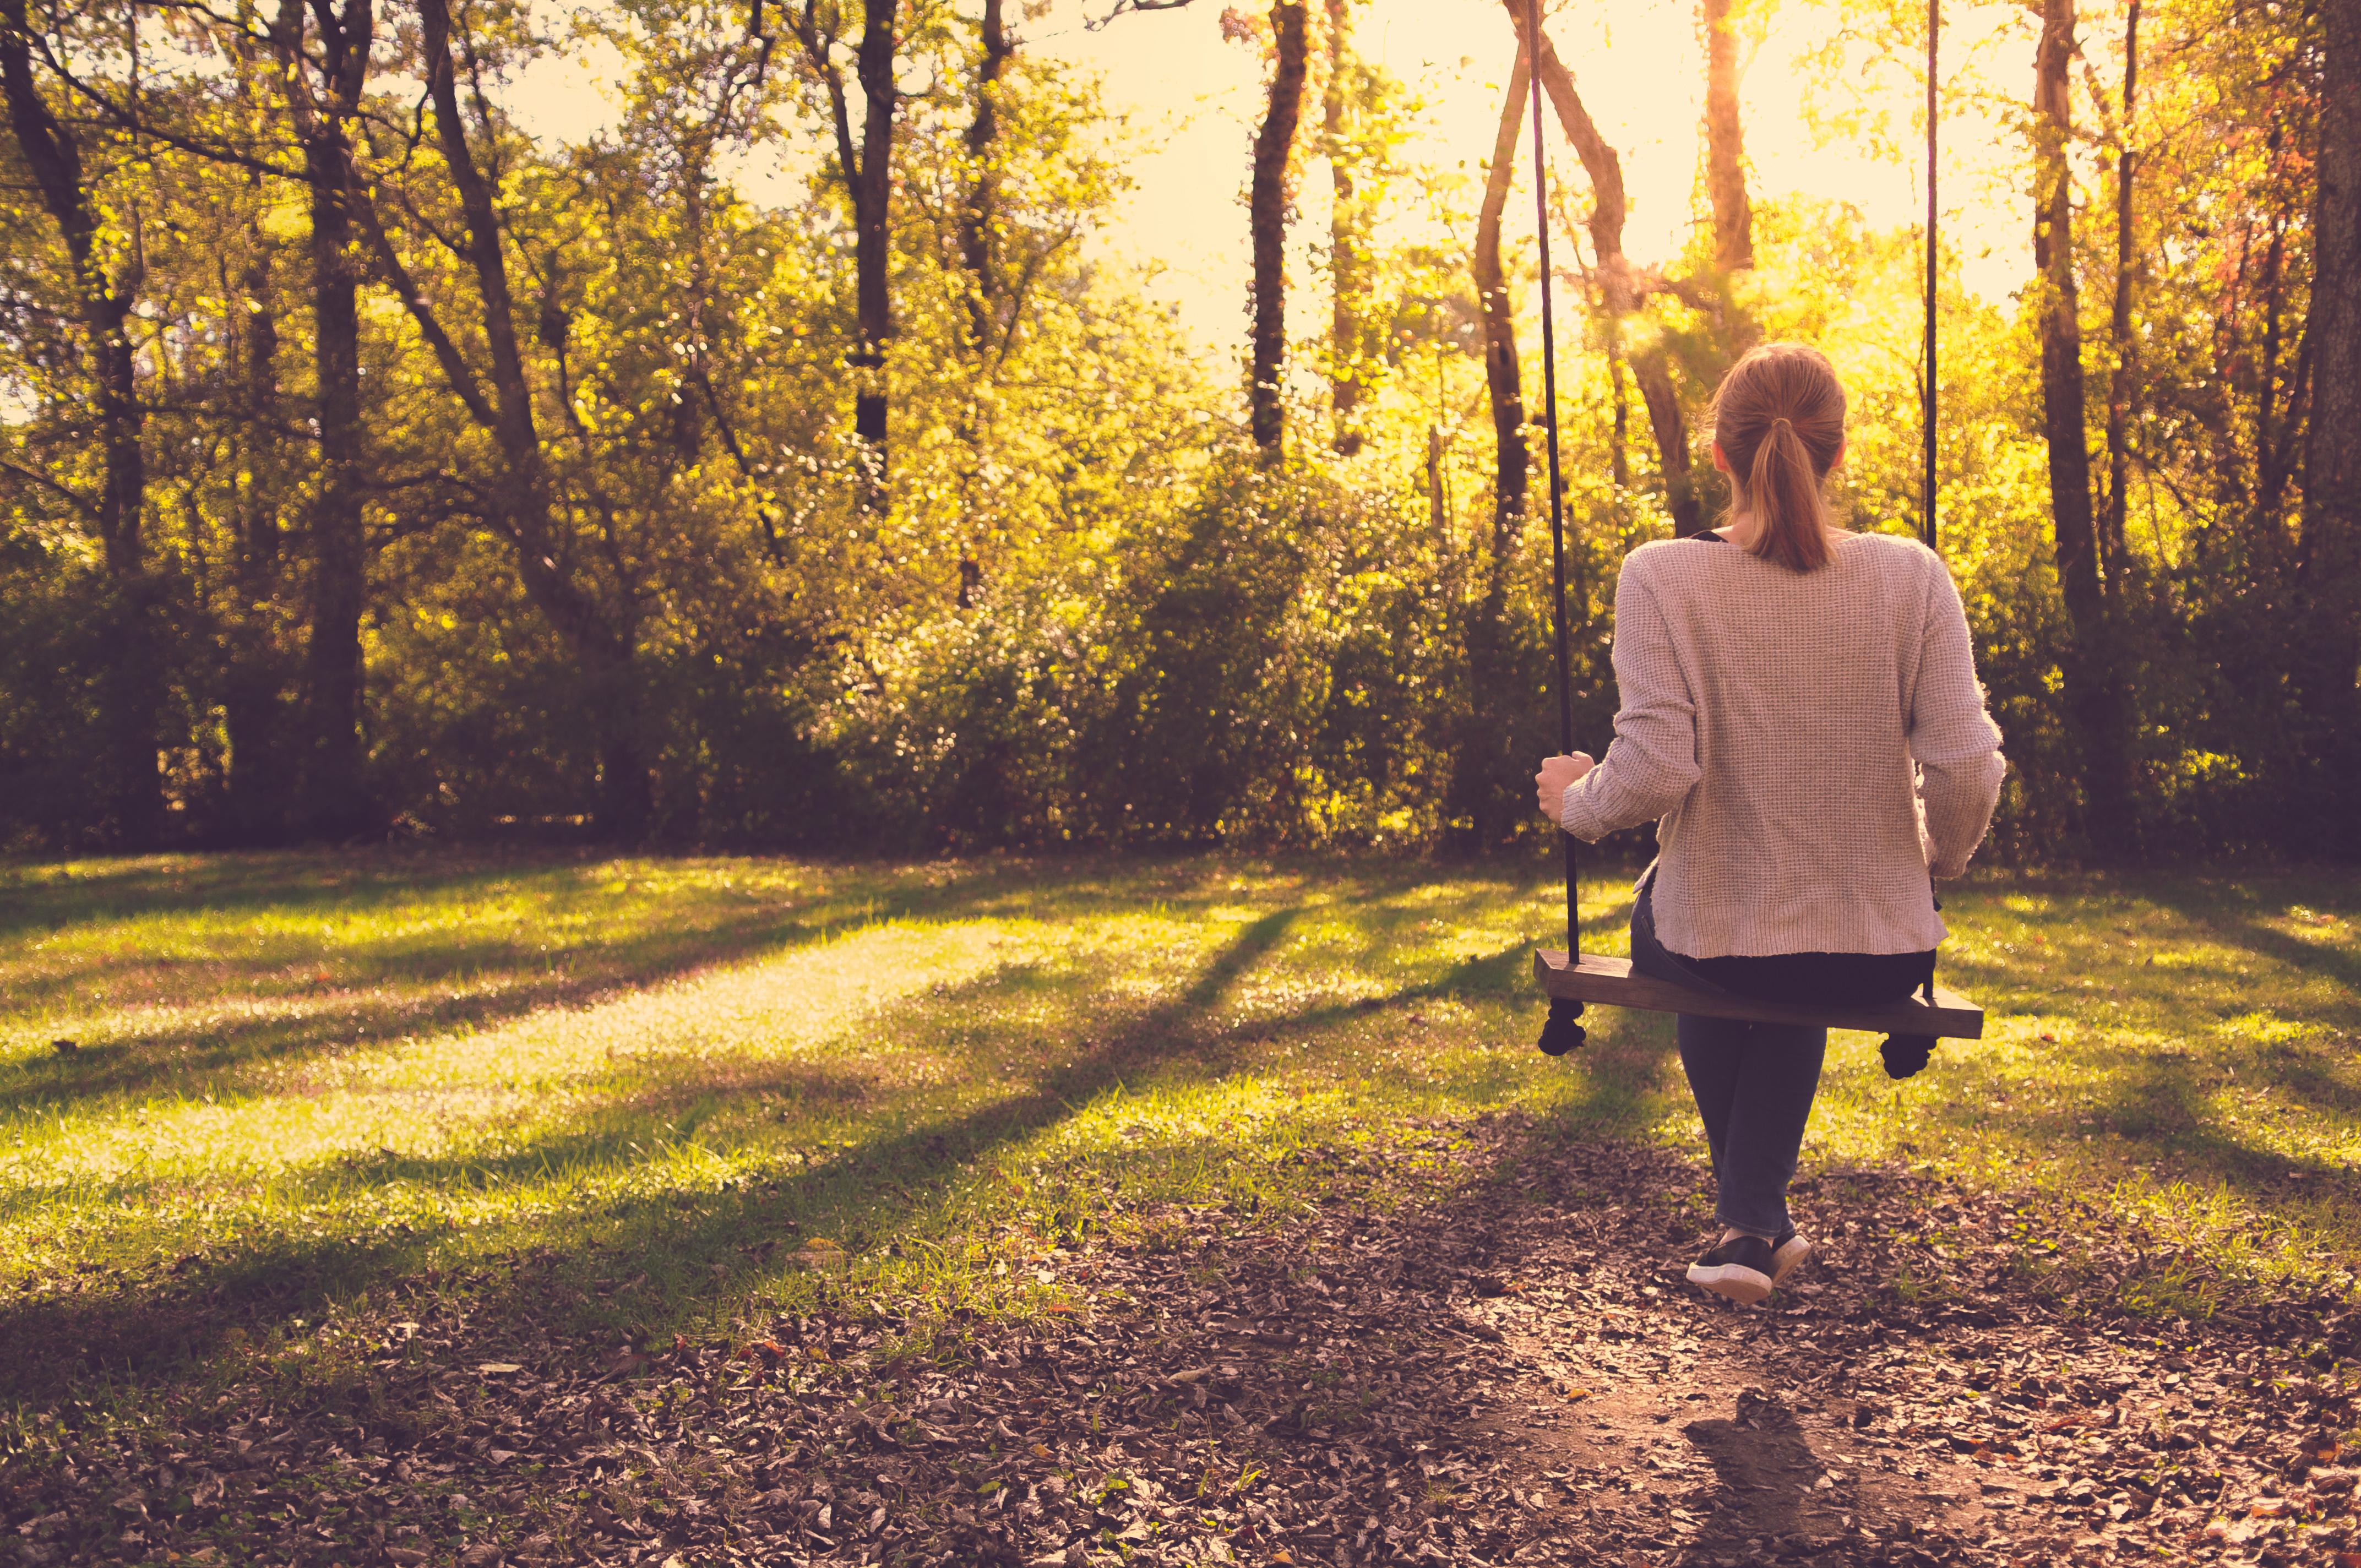 Girl Sitting Alone On Swing In Autumn